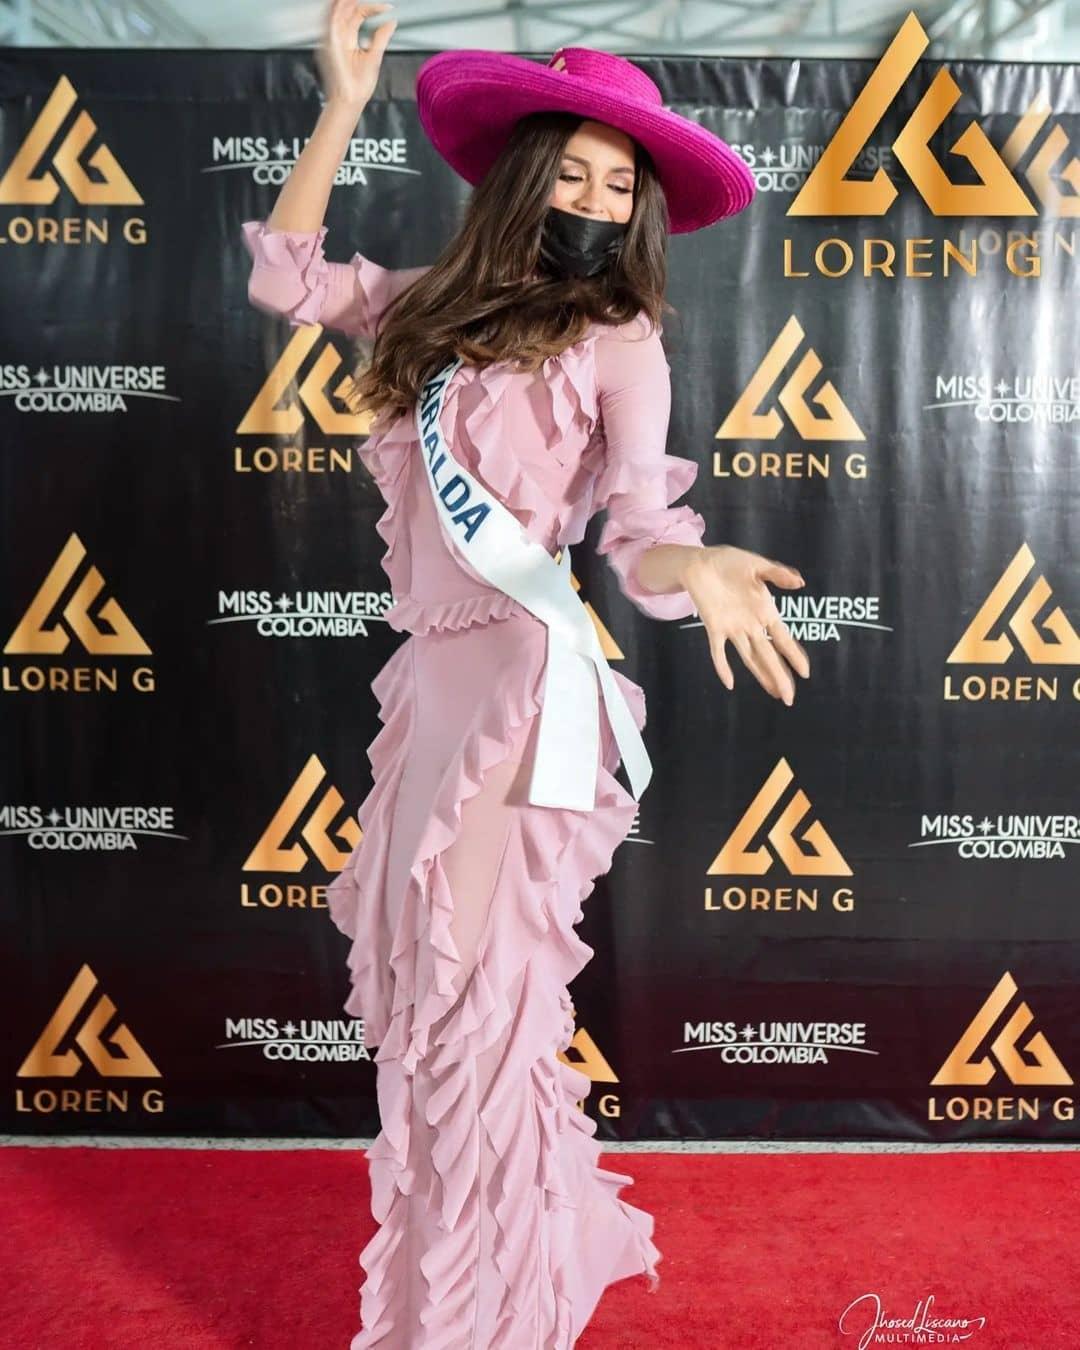 maria alejandra lopez perez, top 2 de miss universe colombia 2021/reyna hispanoamericana 2013/miss caraibes hibiscus 2014/miss colombia mundo 2015. - Página 3 24057913